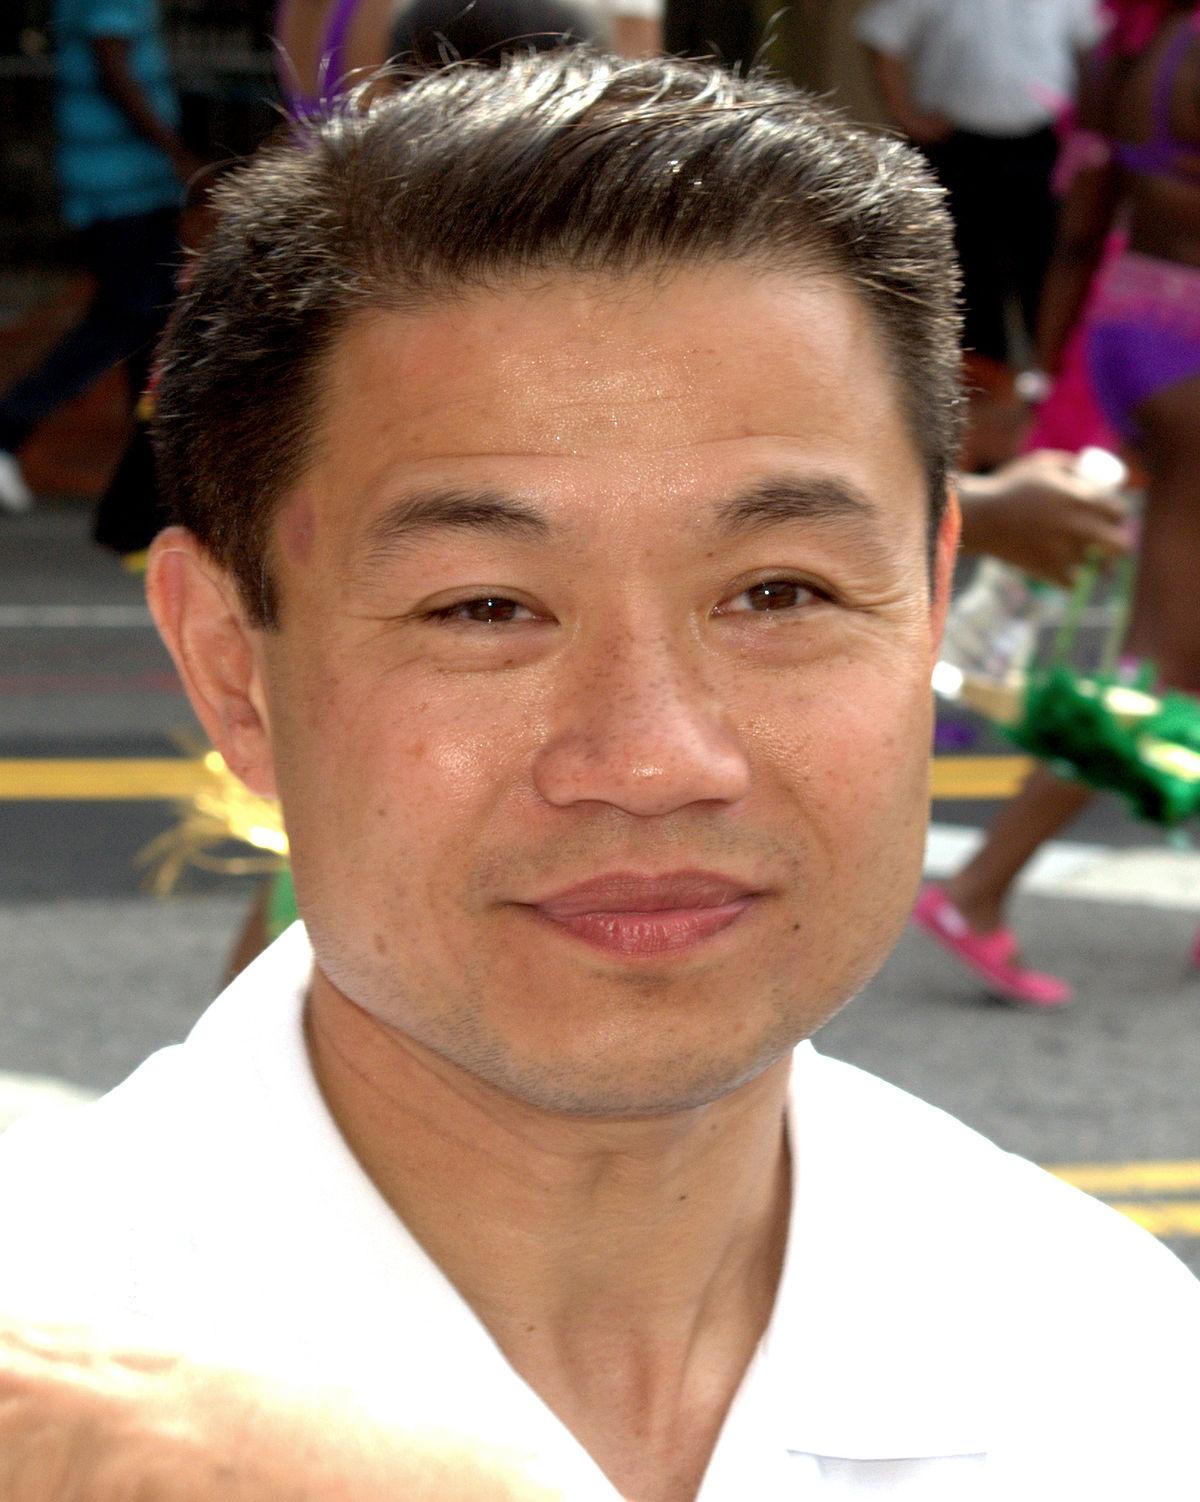 johnny liu_John Liu - Wikipedia